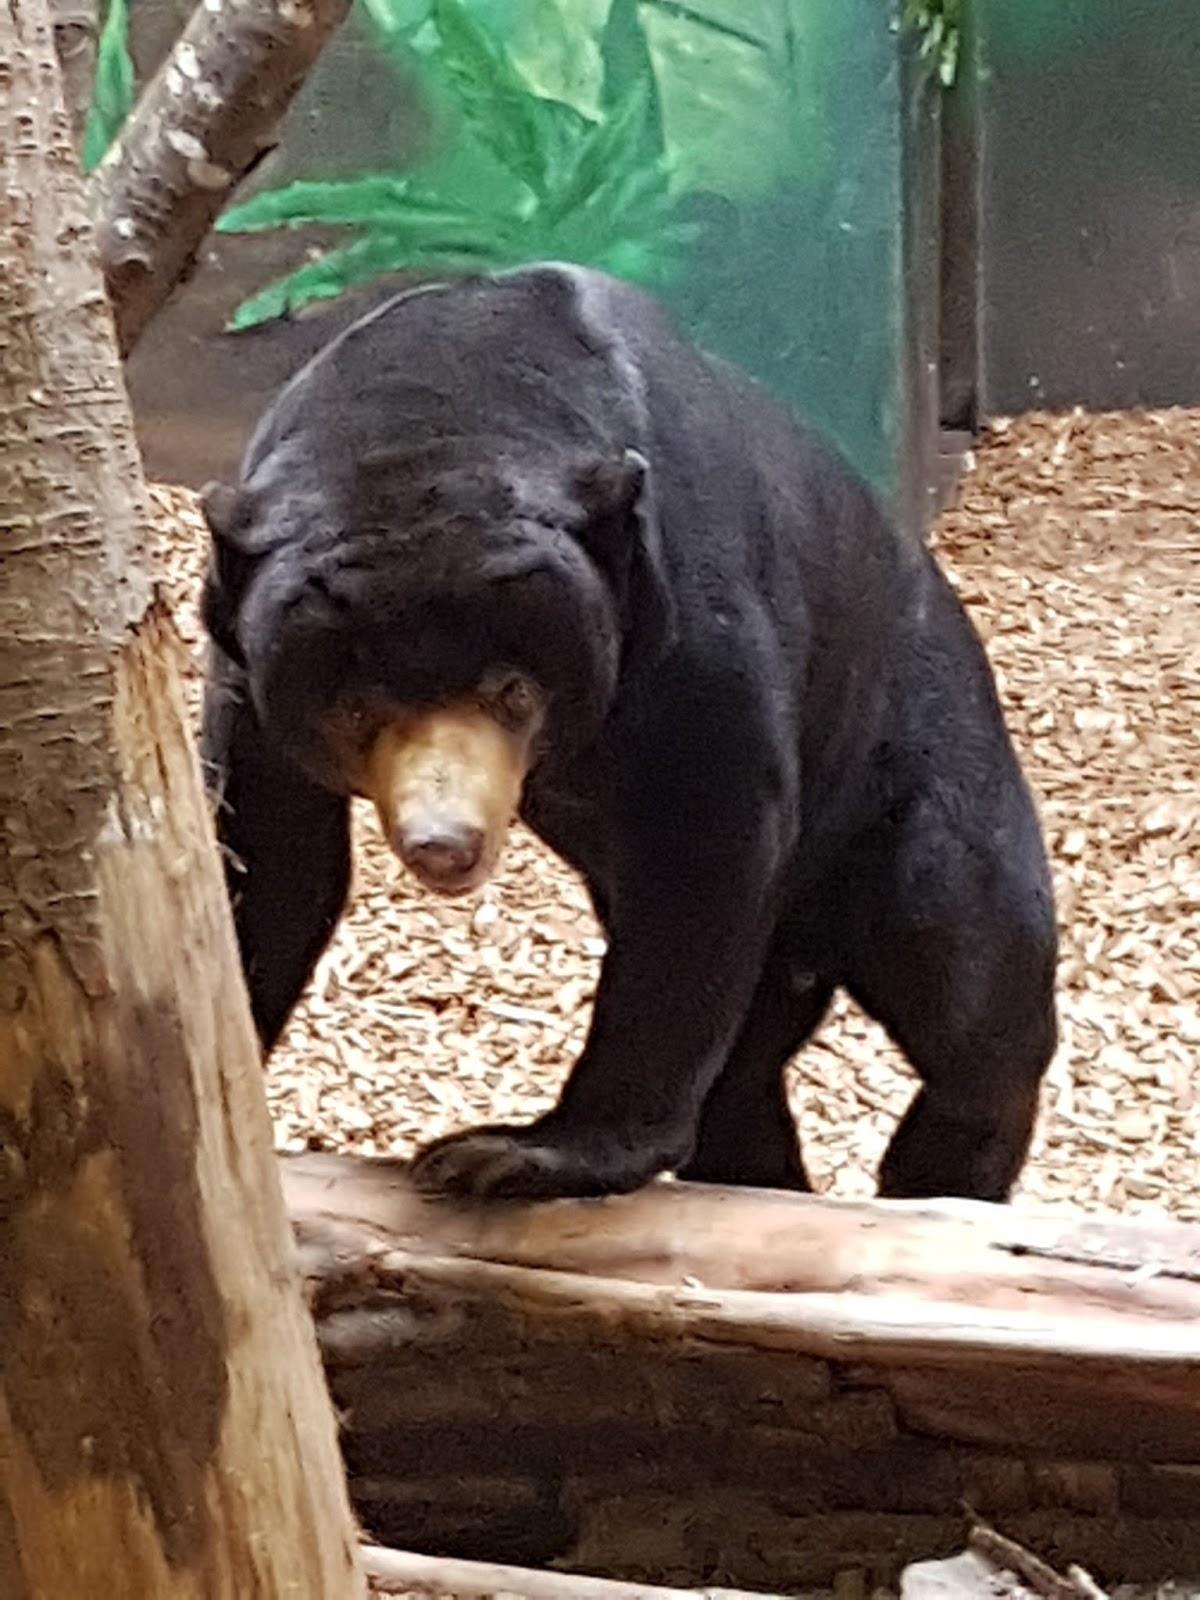 A black bear facing towards the camera climbing slightly onto a branch